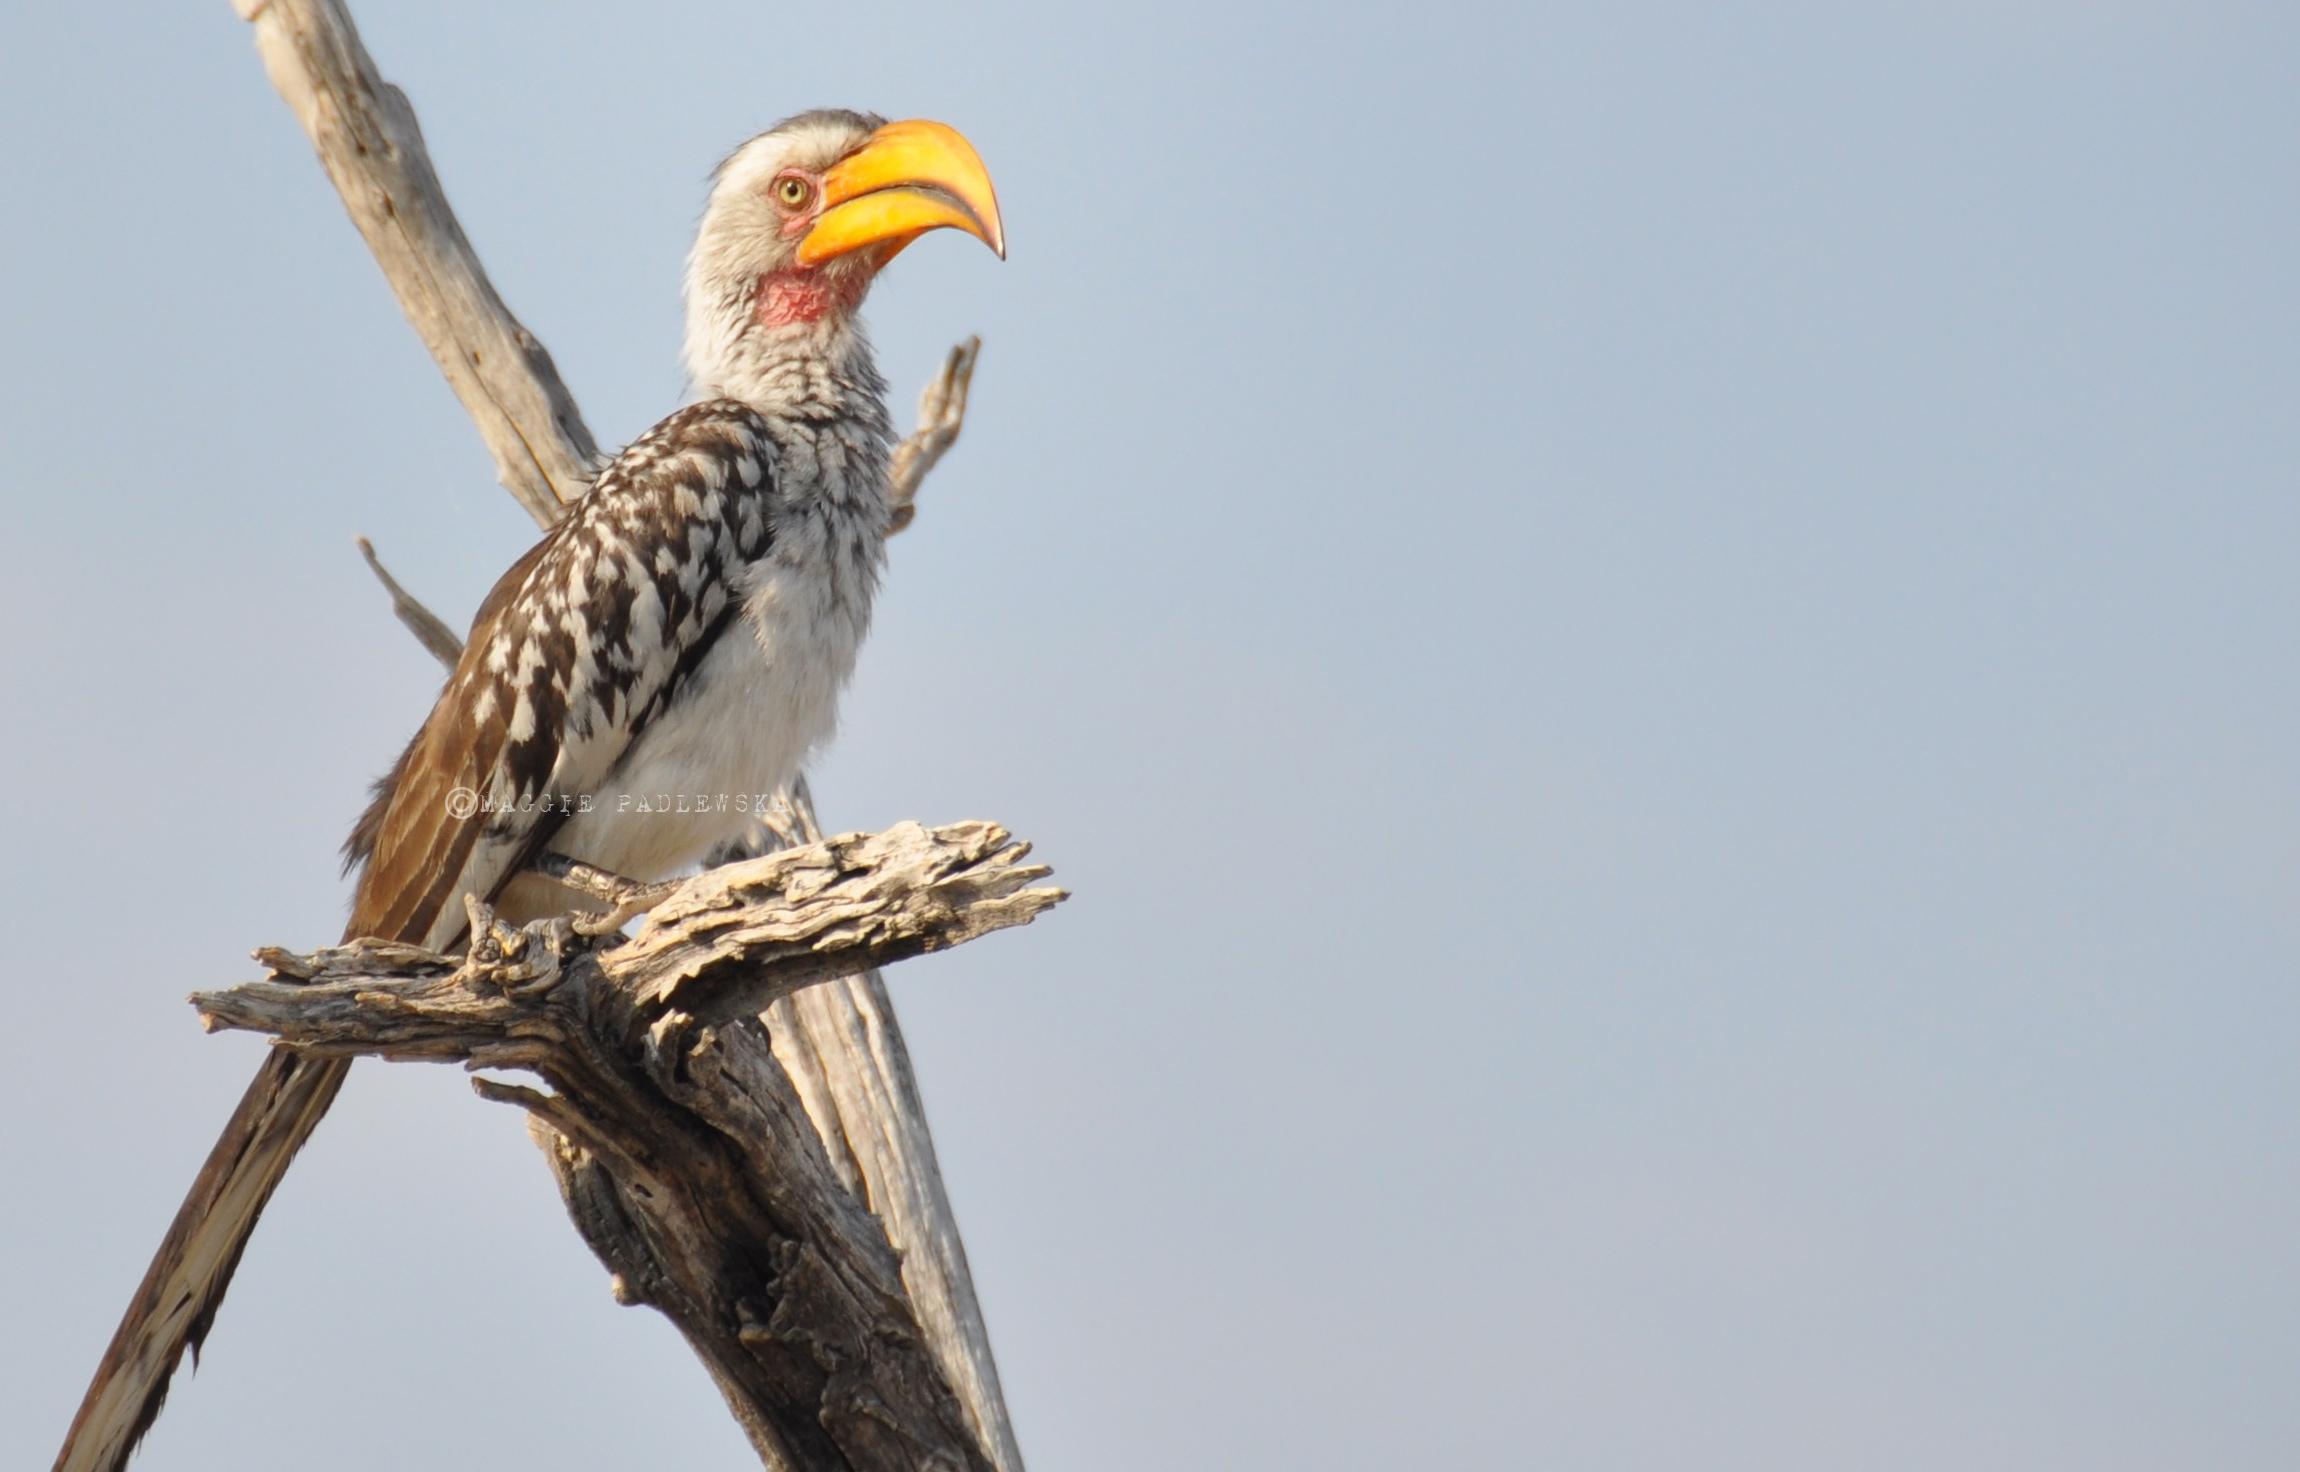 PADLEWSKA-Ptak